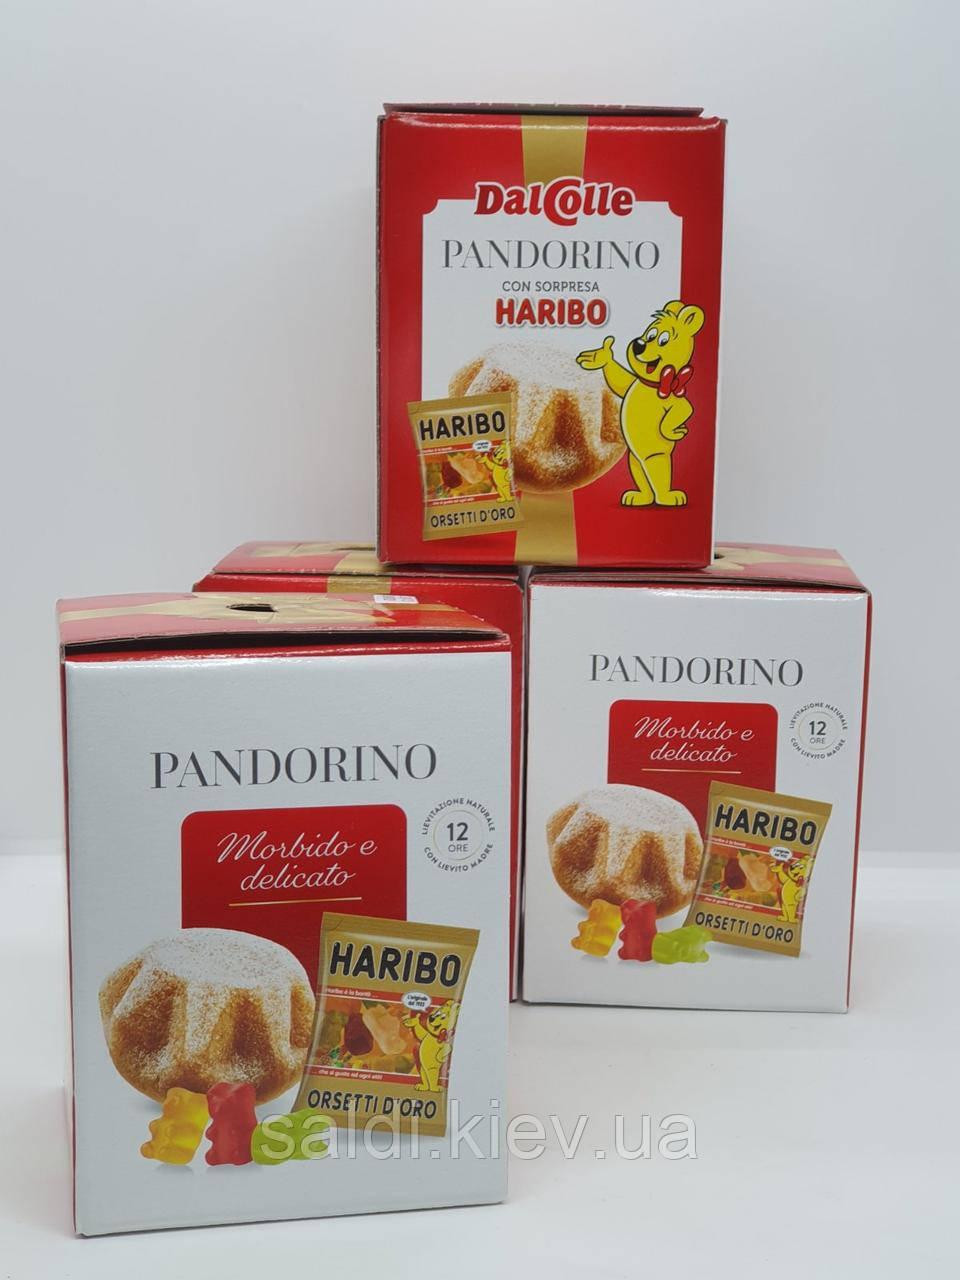 Пандорино классический Dalcolle, 62 г -ИТАЛИЯ